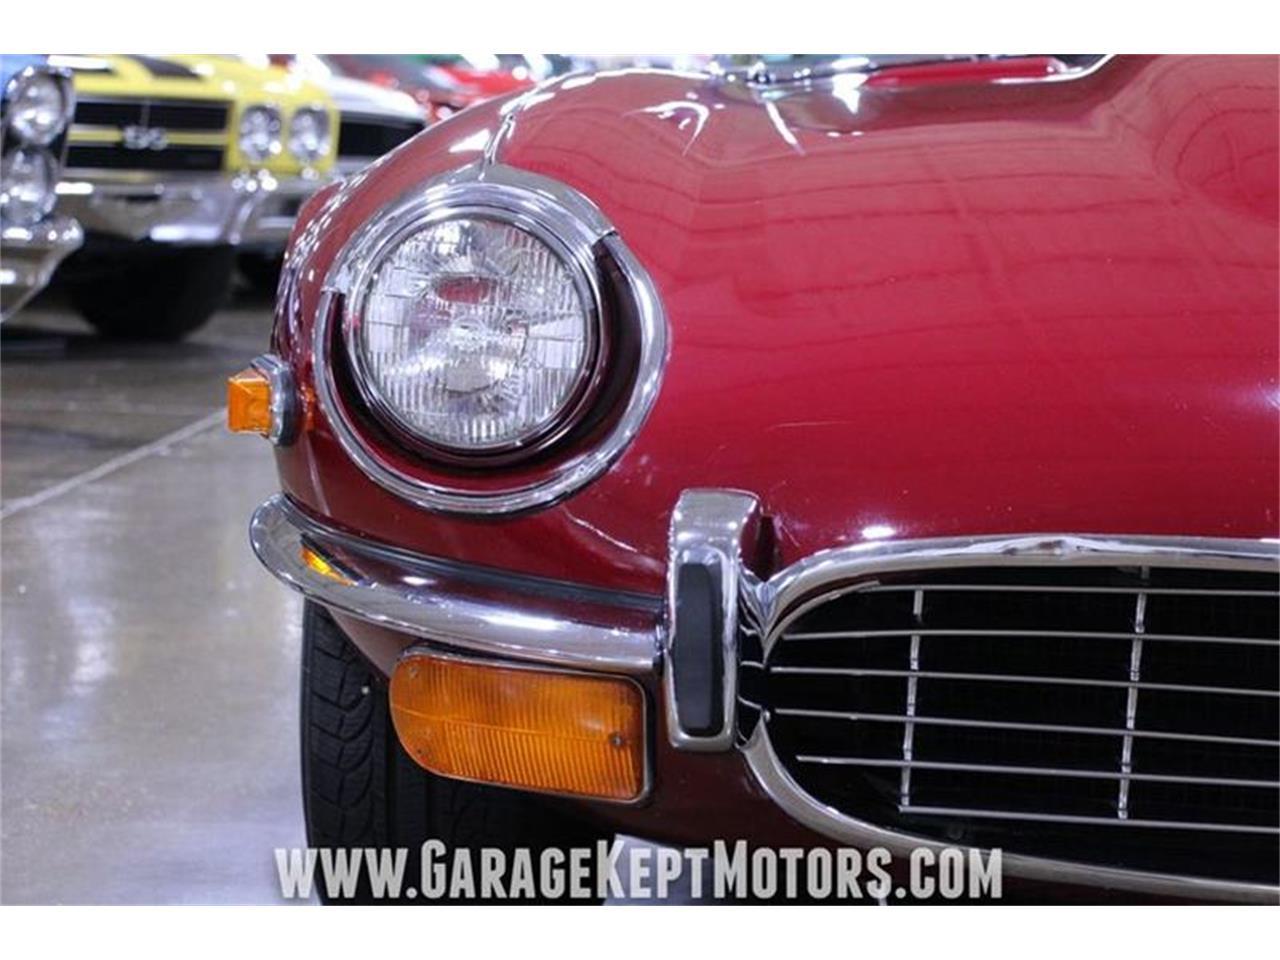 Large Picture of Classic 1971 Jaguar E-Type located in Grand Rapids Michigan - $62,900.00 - QP0V